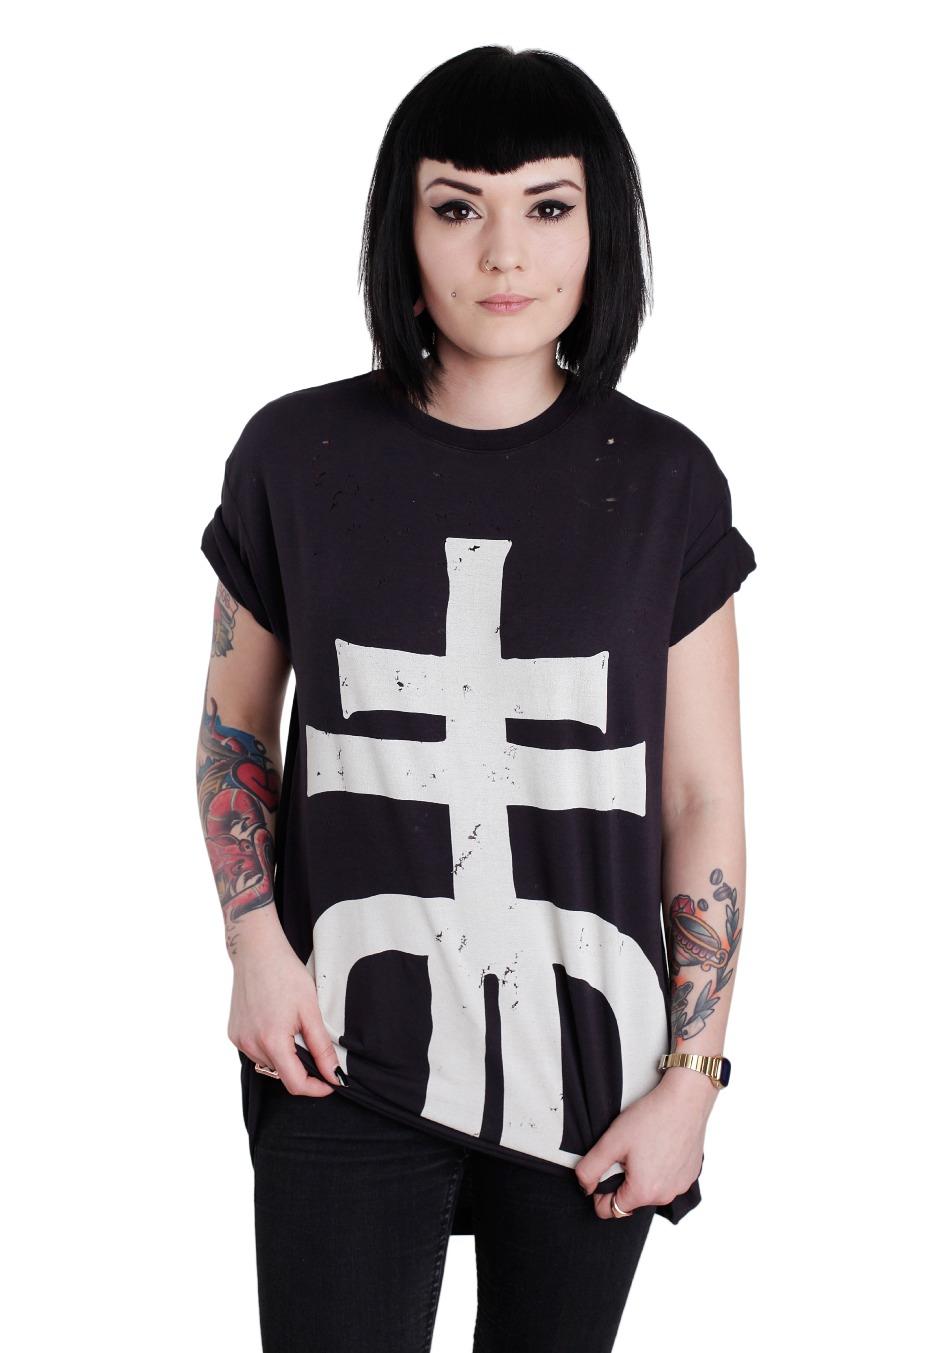 Drop Dead - Cross - T-Shirt - Impericon.com WorldwideDrop Dead Clothing Ghost